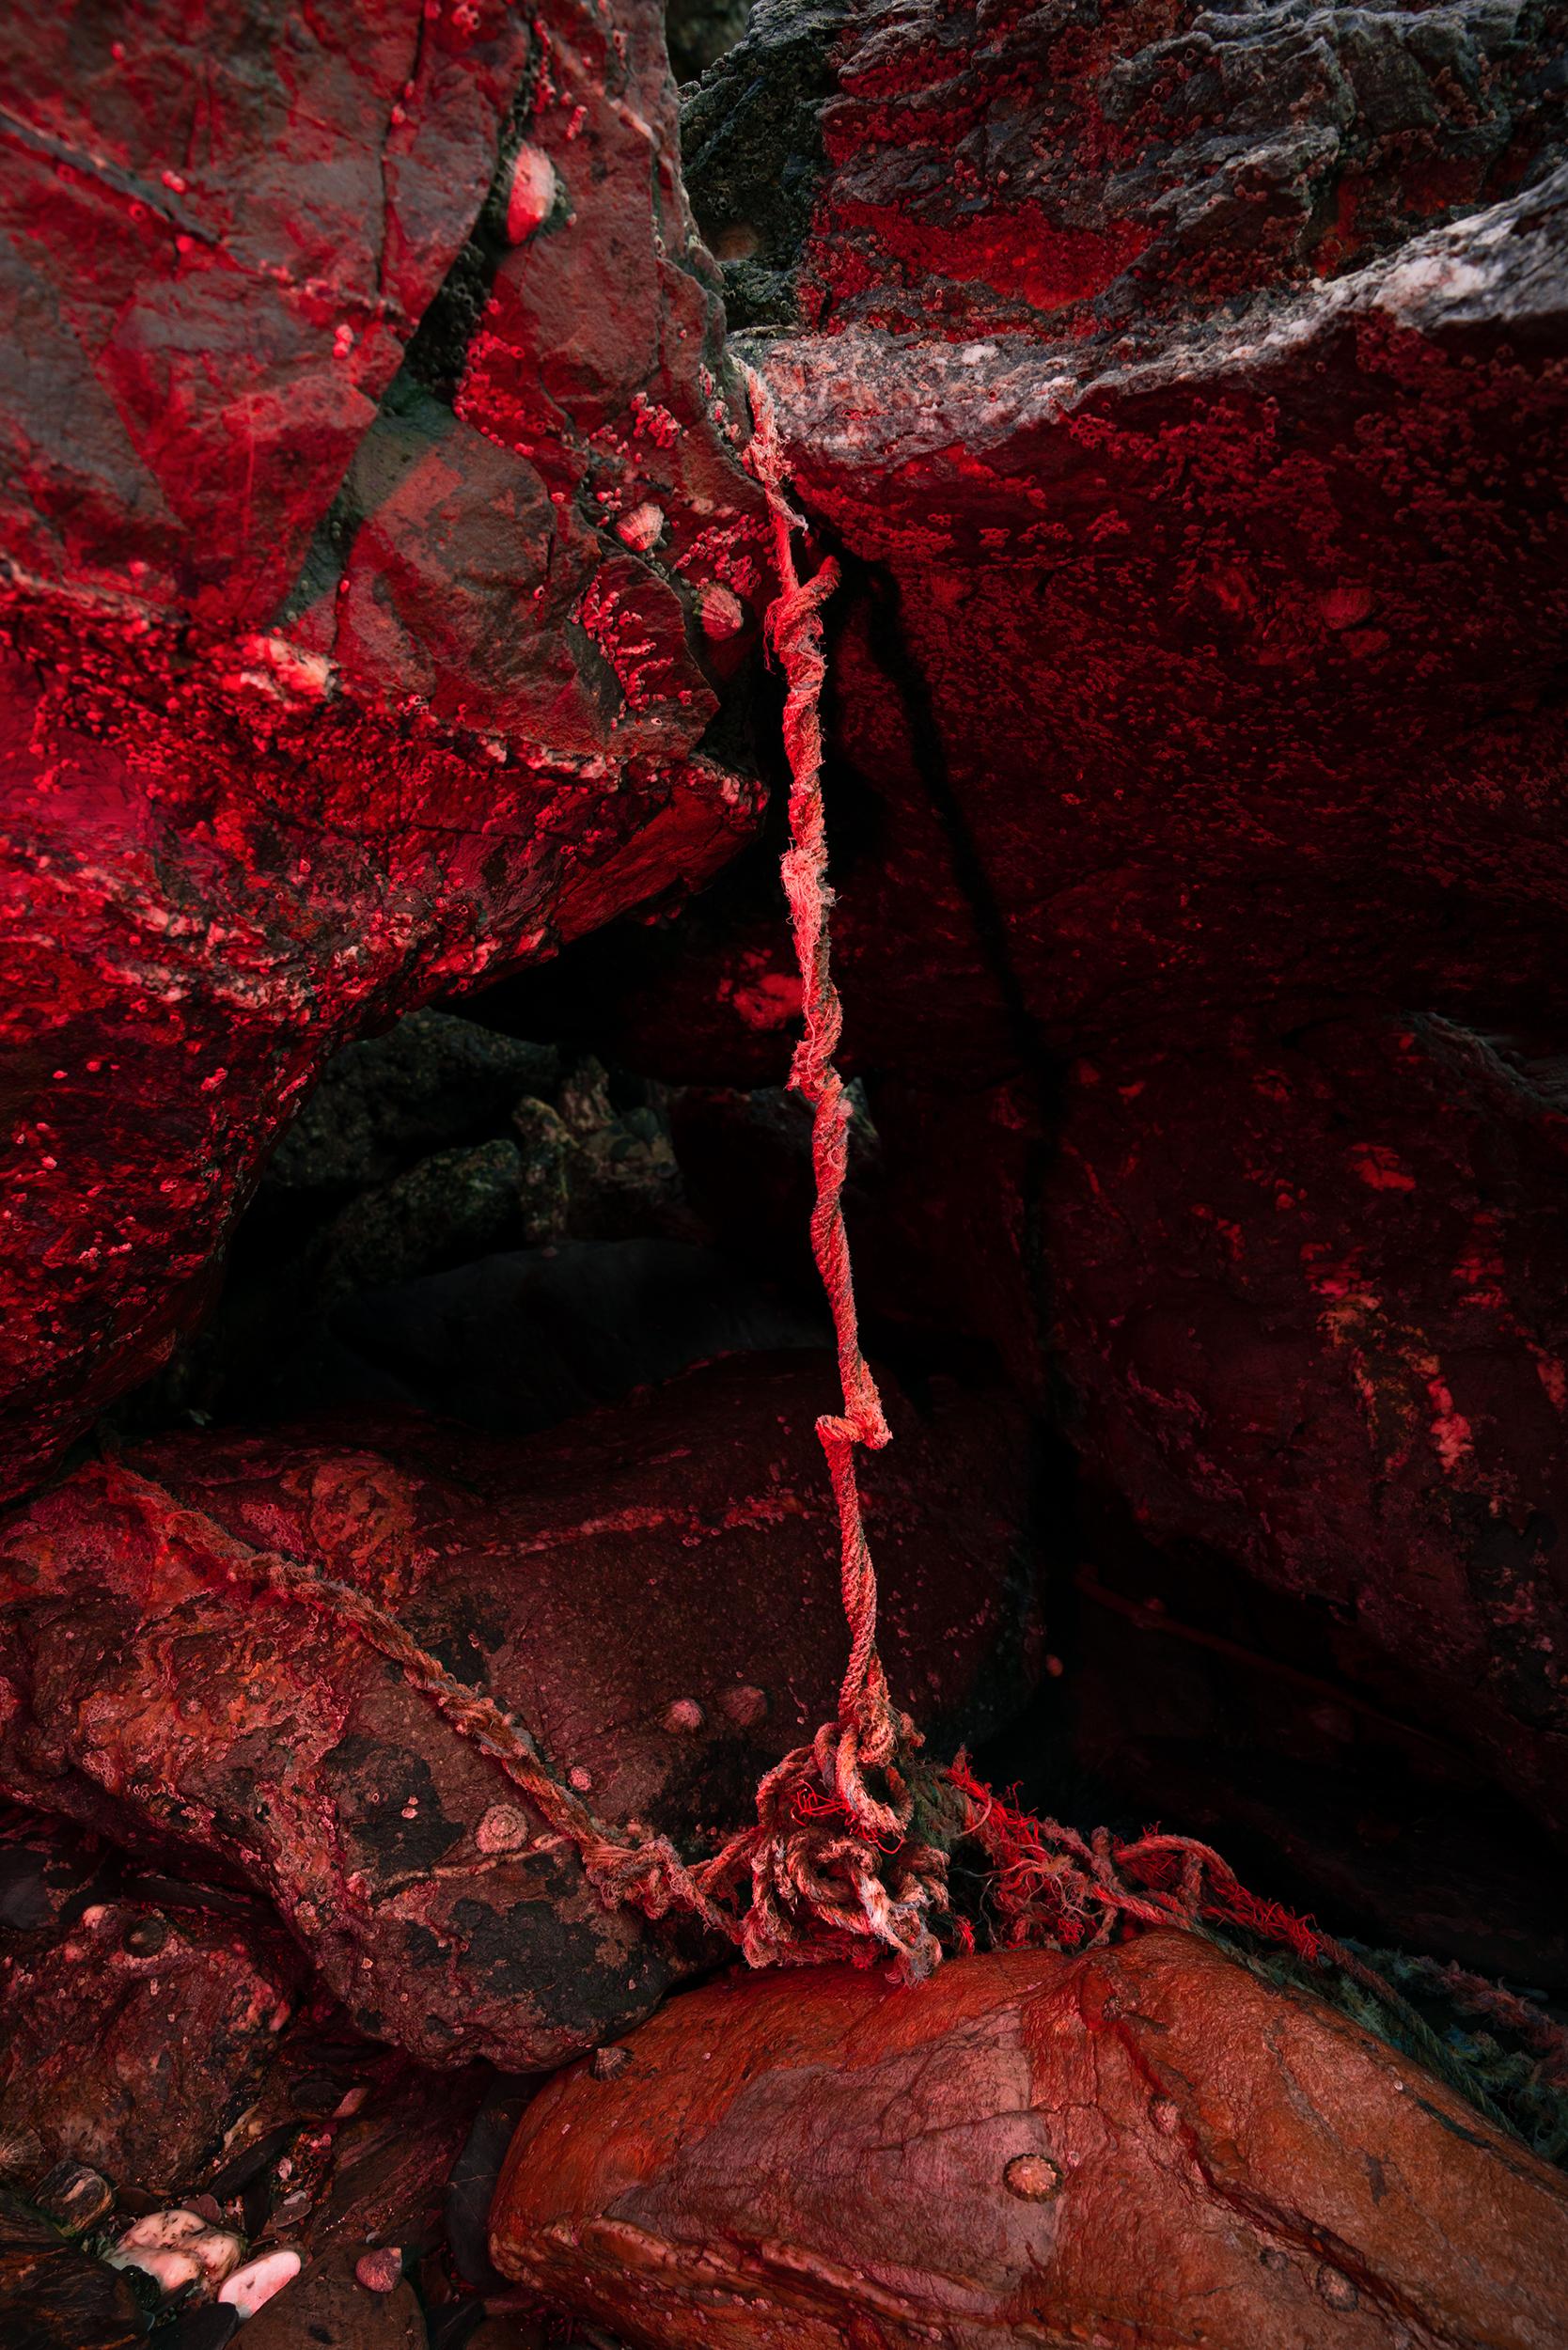 The Bridge by Elena Helfrecht from Revolv Collective's exhibition Intro:spective.